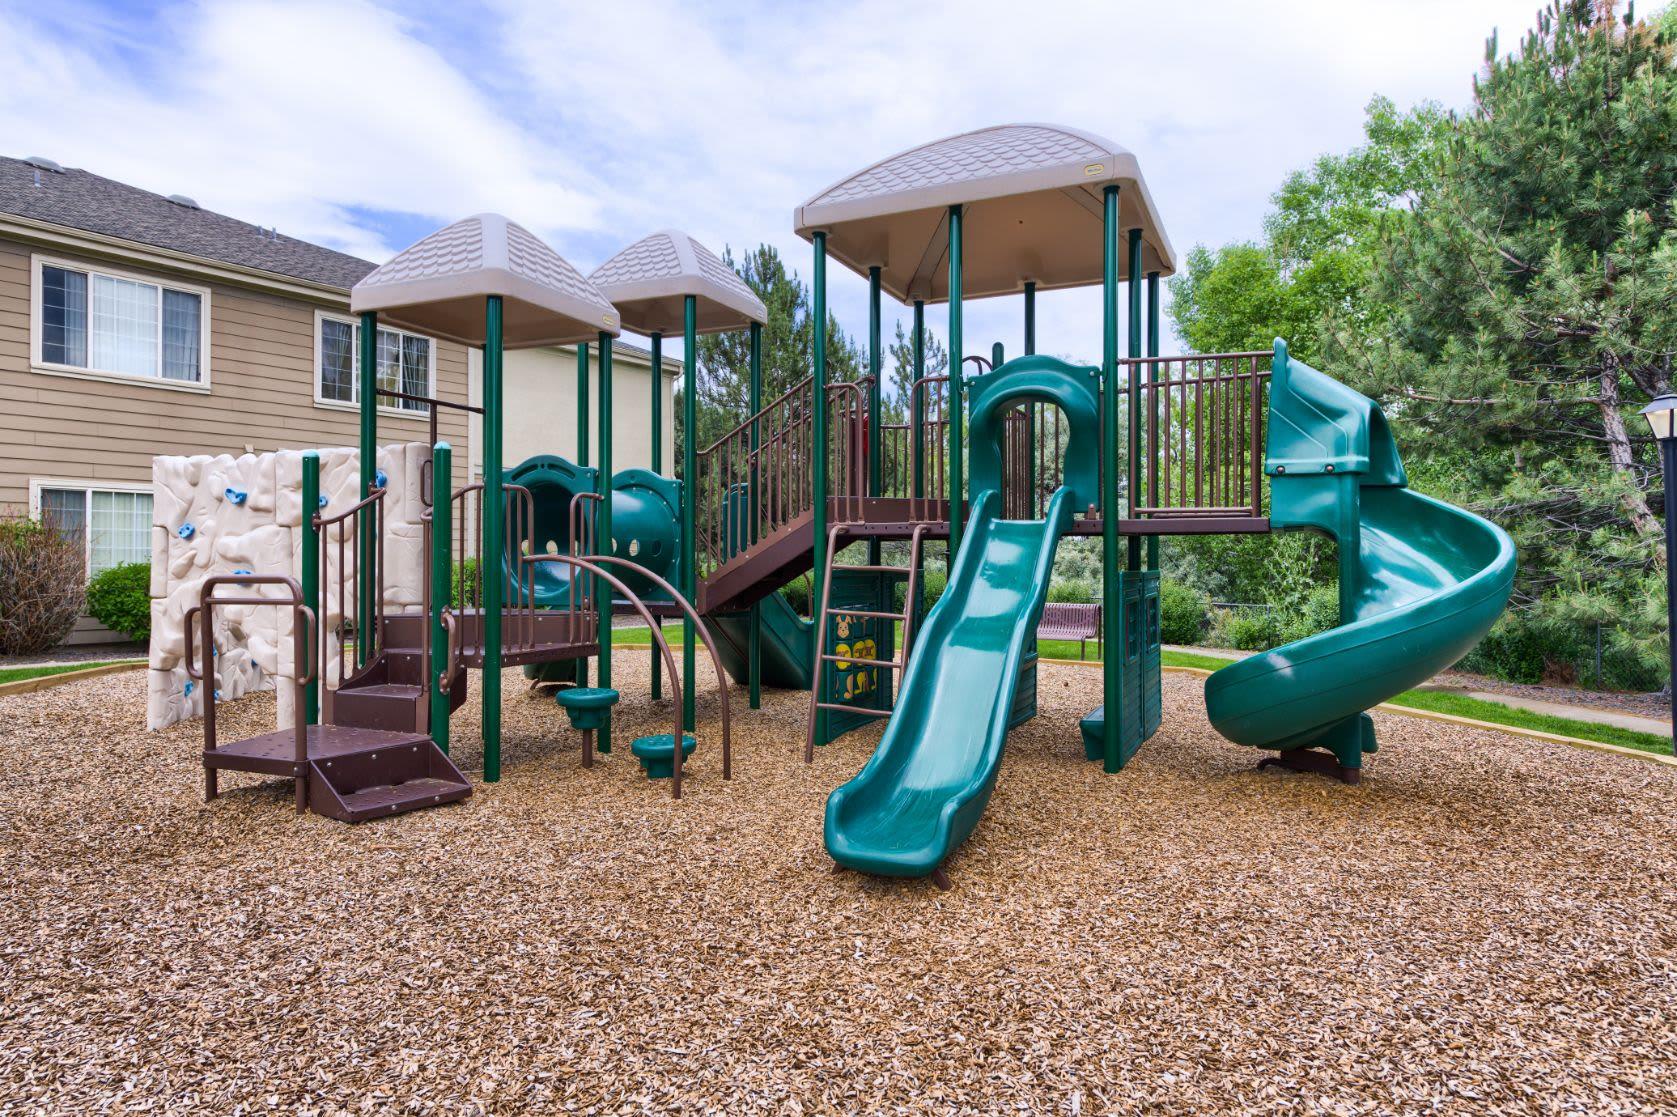 Playground at Whisper Creek Apartment Homes in Lakewood, Colorado